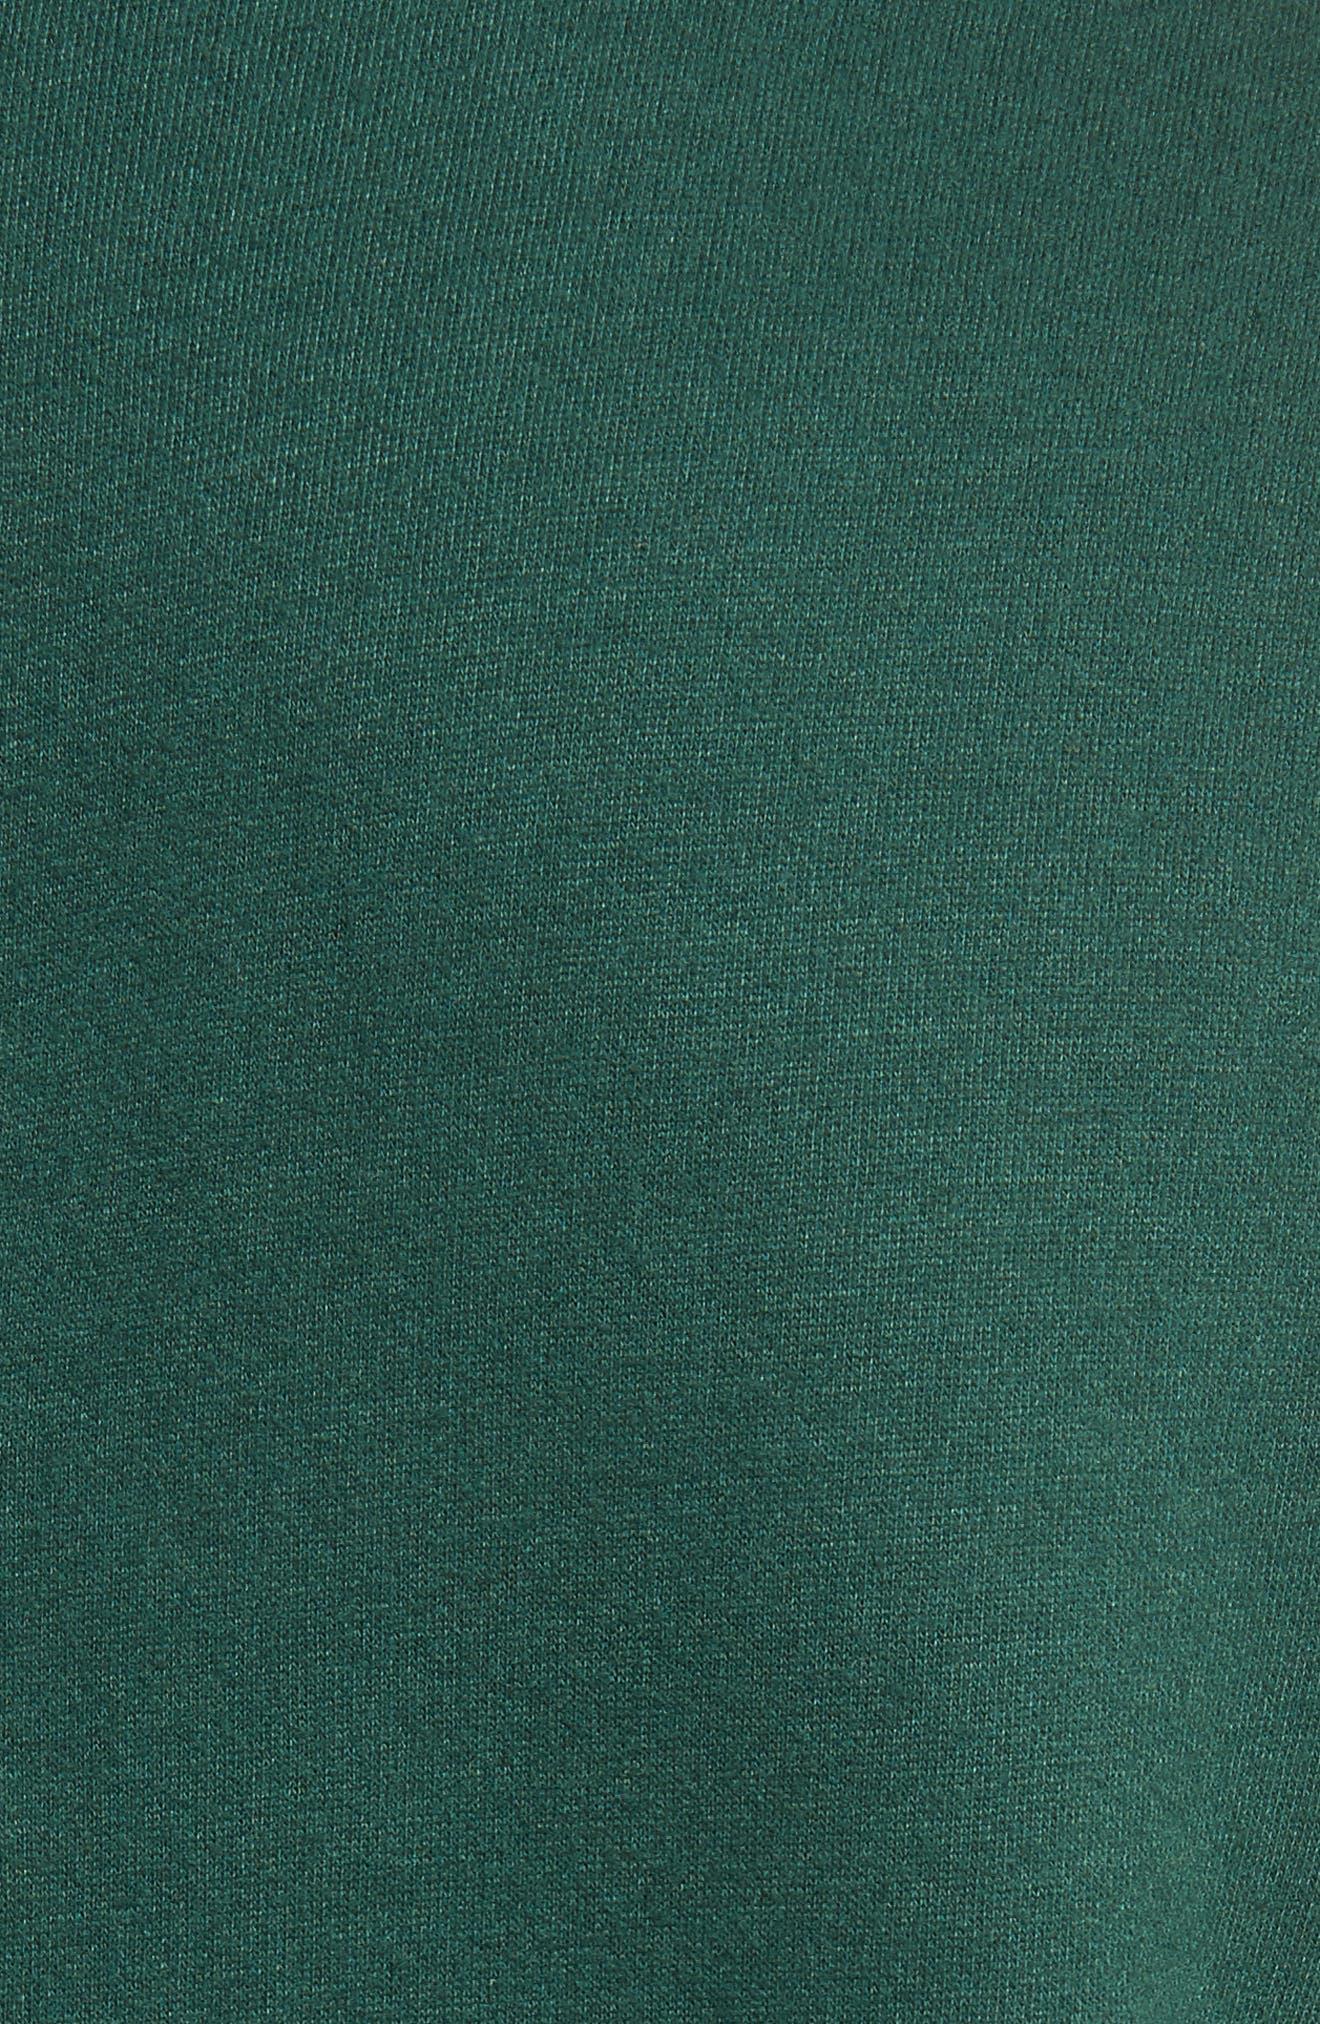 Crewneck Sweater,                             Alternate thumbnail 5, color,                             362